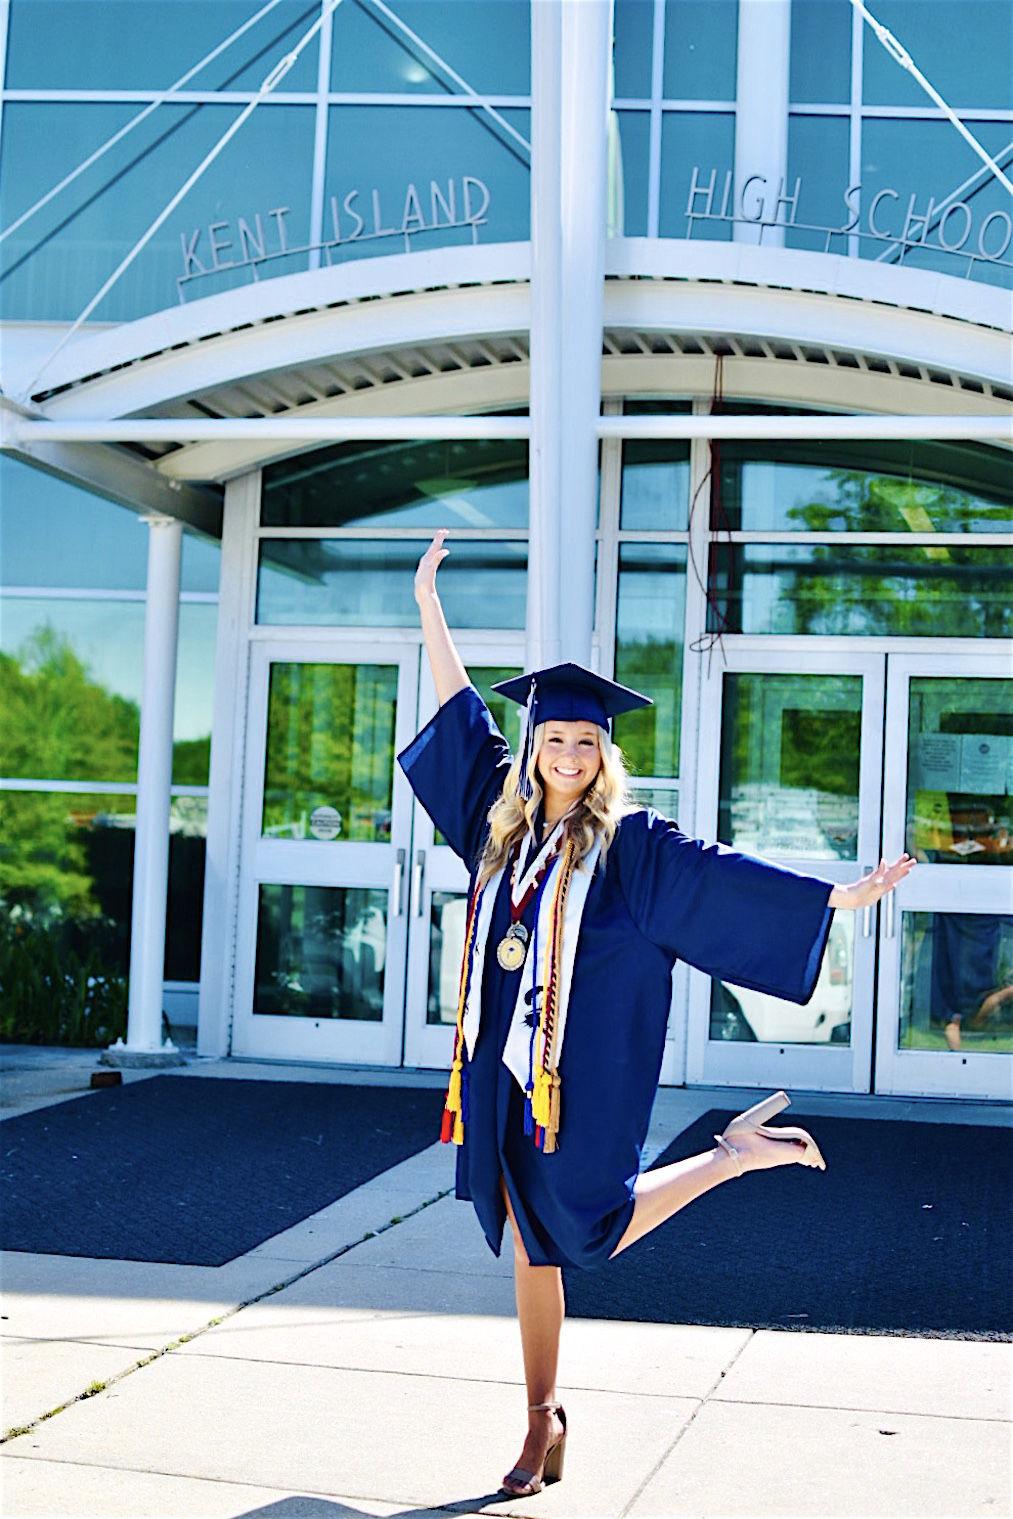 Kent Island High School Graduation 2020